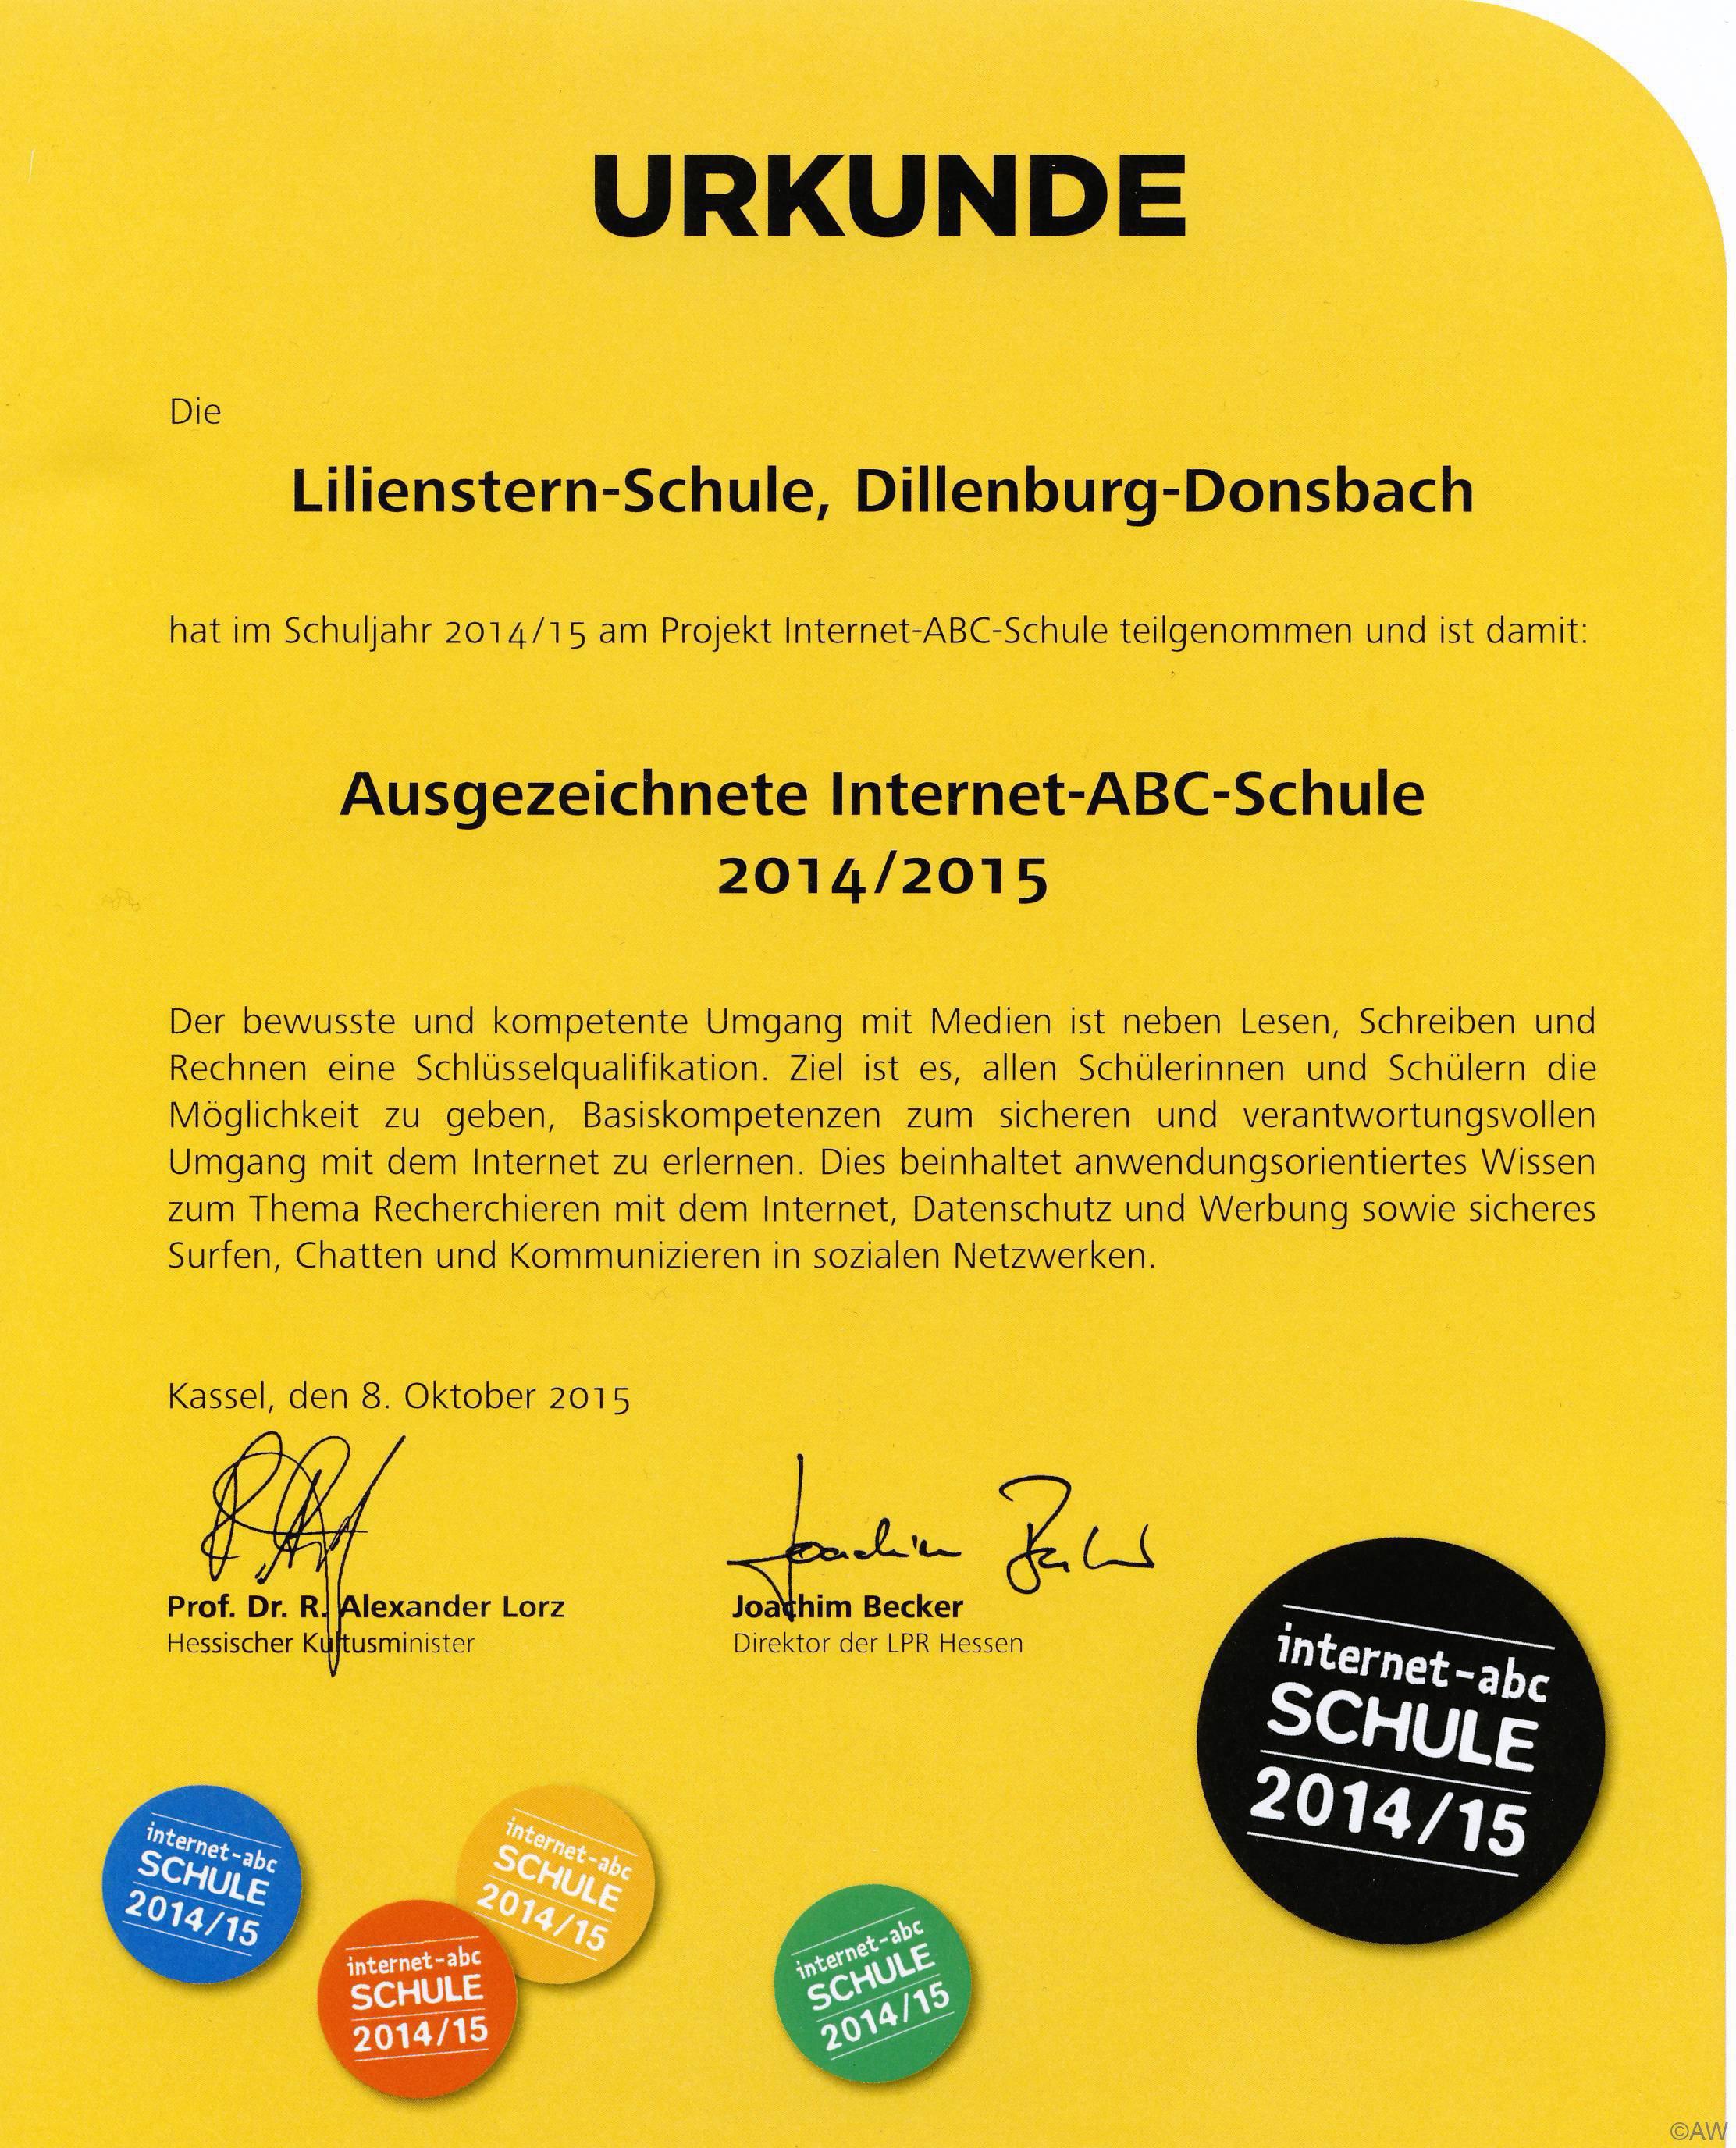 urkunde-internet-abc-schule-2014_2015